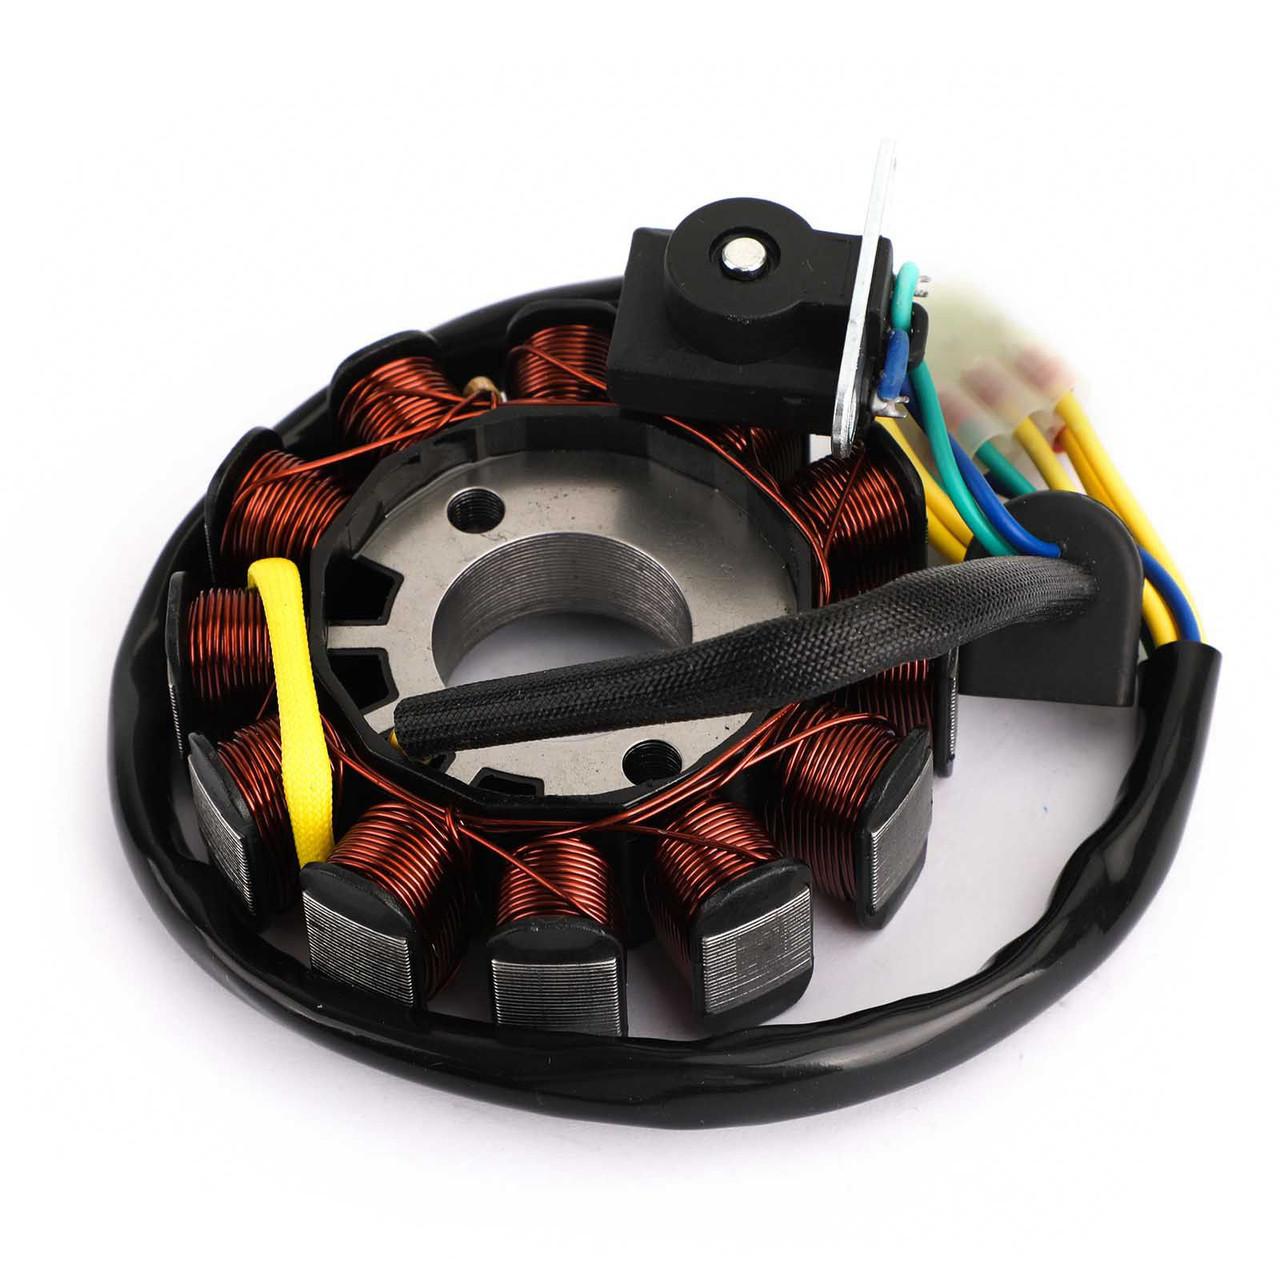 Magneto Generator Engine Stator Rotor Coil Fit For Polaris Outlaw / Sportsman 110 EFI L/C 16-20